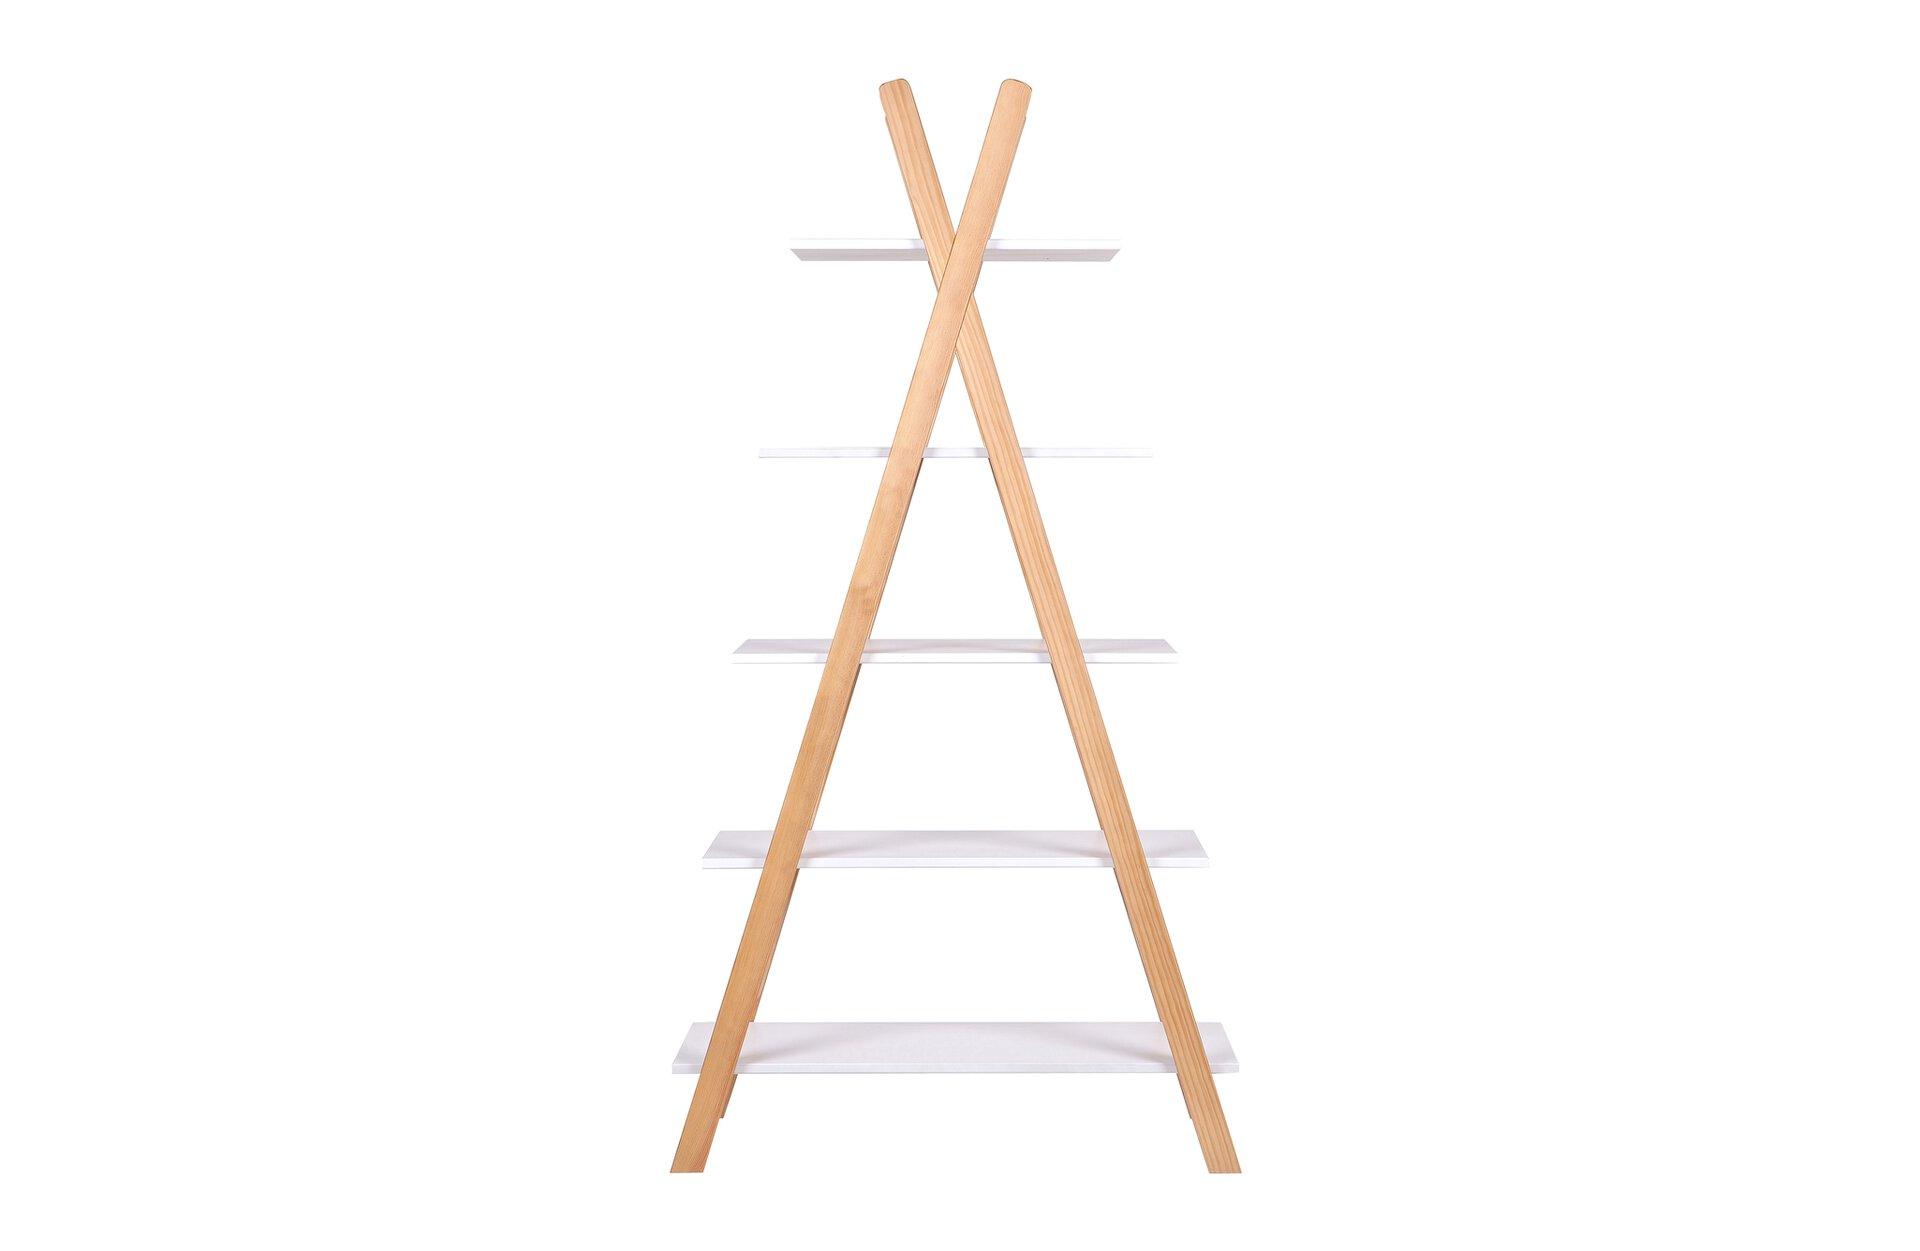 Regal TIPI inbuy Holzwerkstoff mehrfarbig 35 x 170 x 90 cm